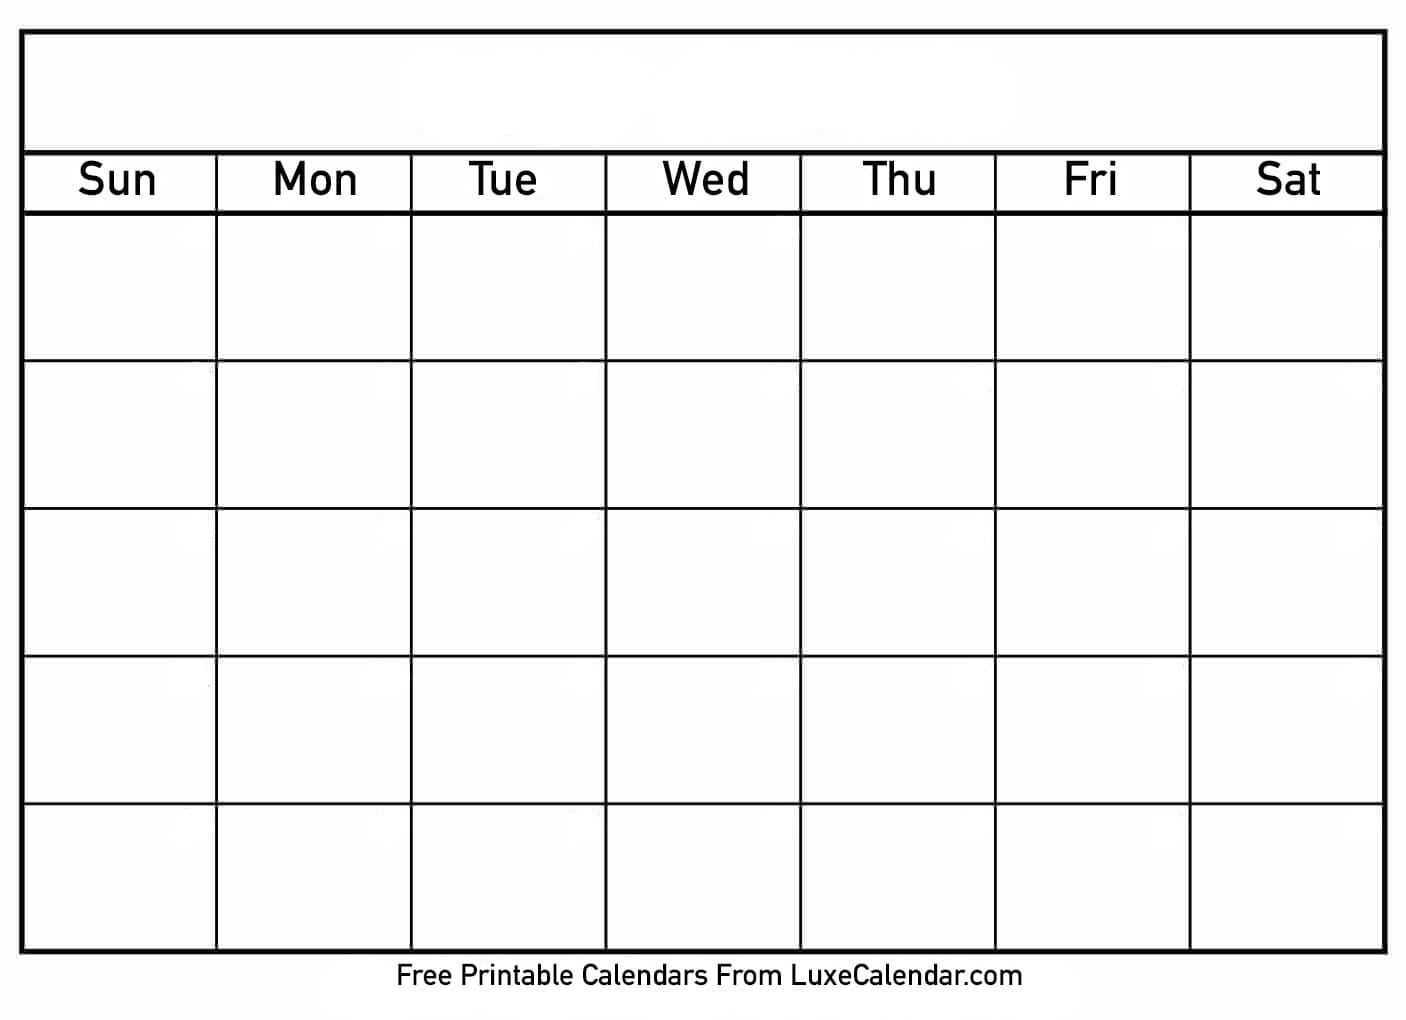 Blank Printable Calendar - Luxe Calendar_Print Blank Calendar By Month